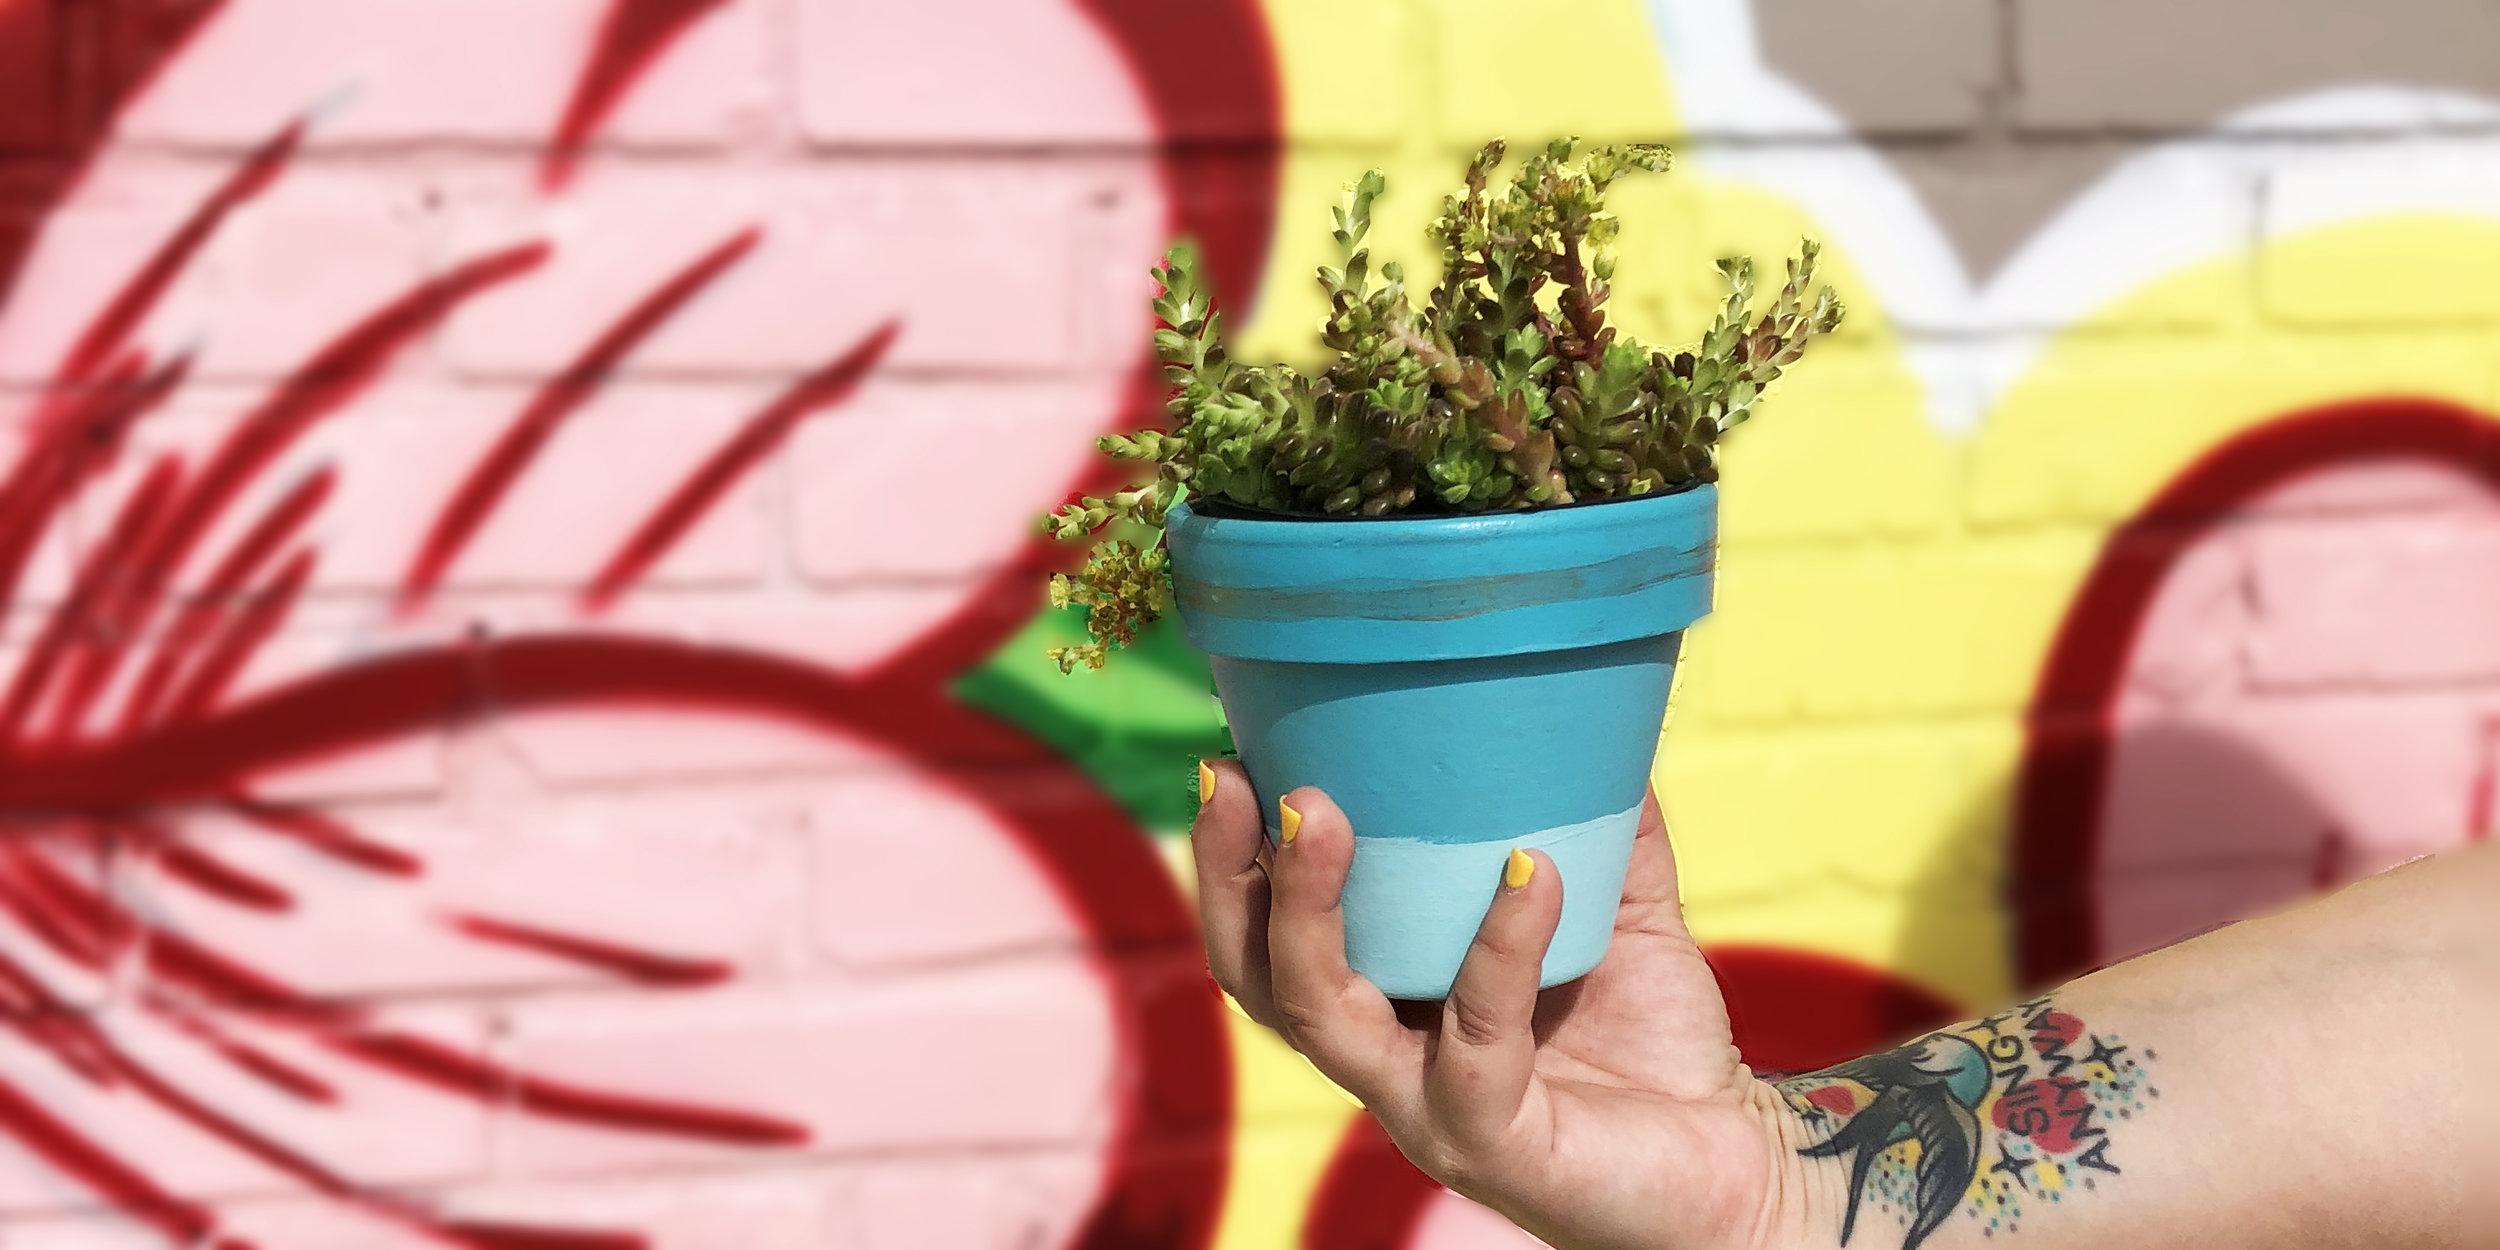 Paint & Plant Teal 1x2.jpg